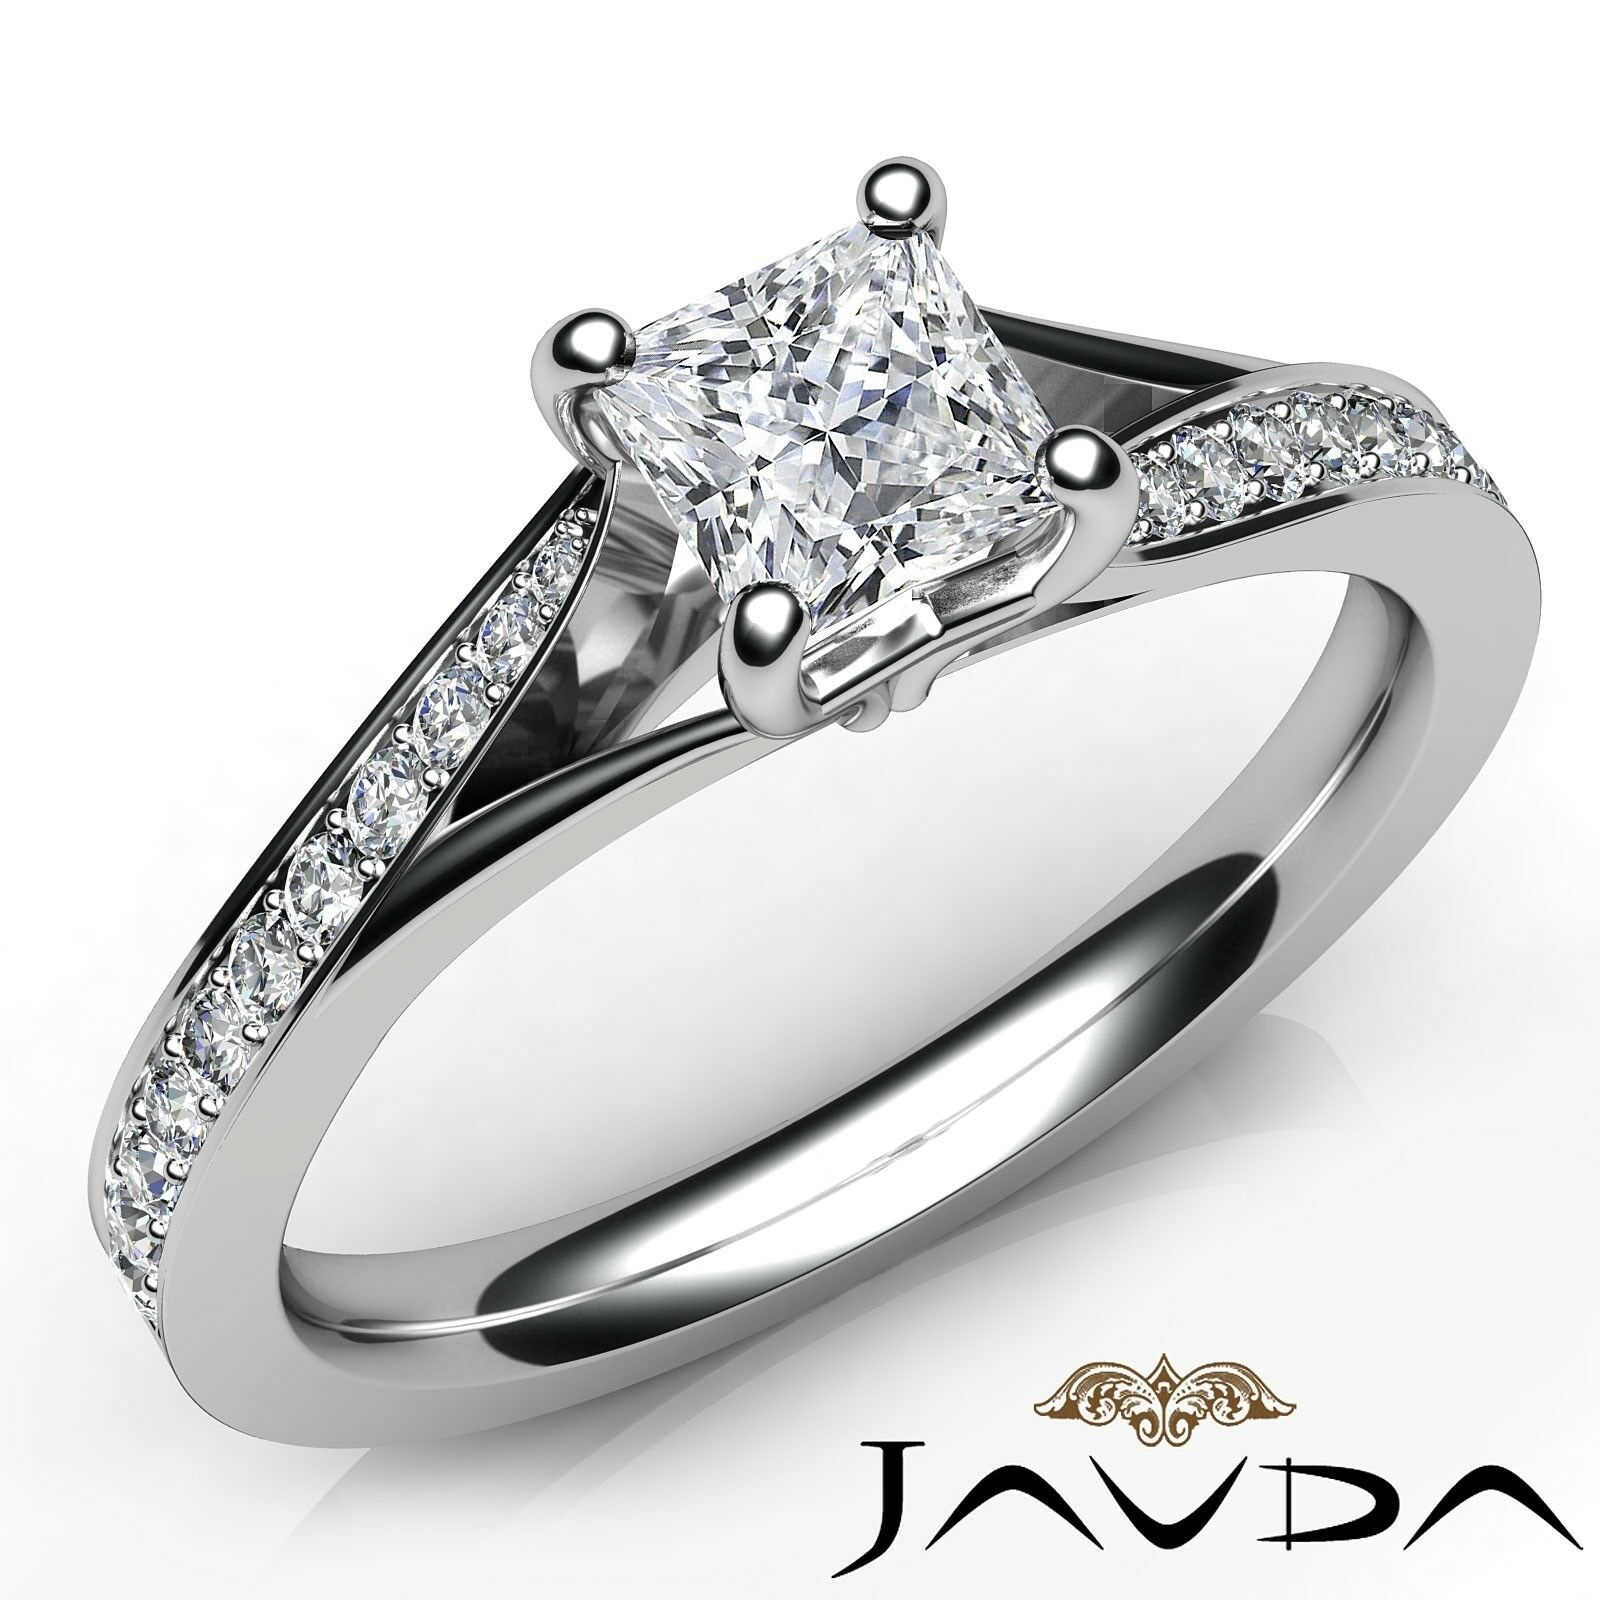 0.92ctw Knife Edge Princess Diamond Engagement Ring GIA J-SI1 White Gold Rings